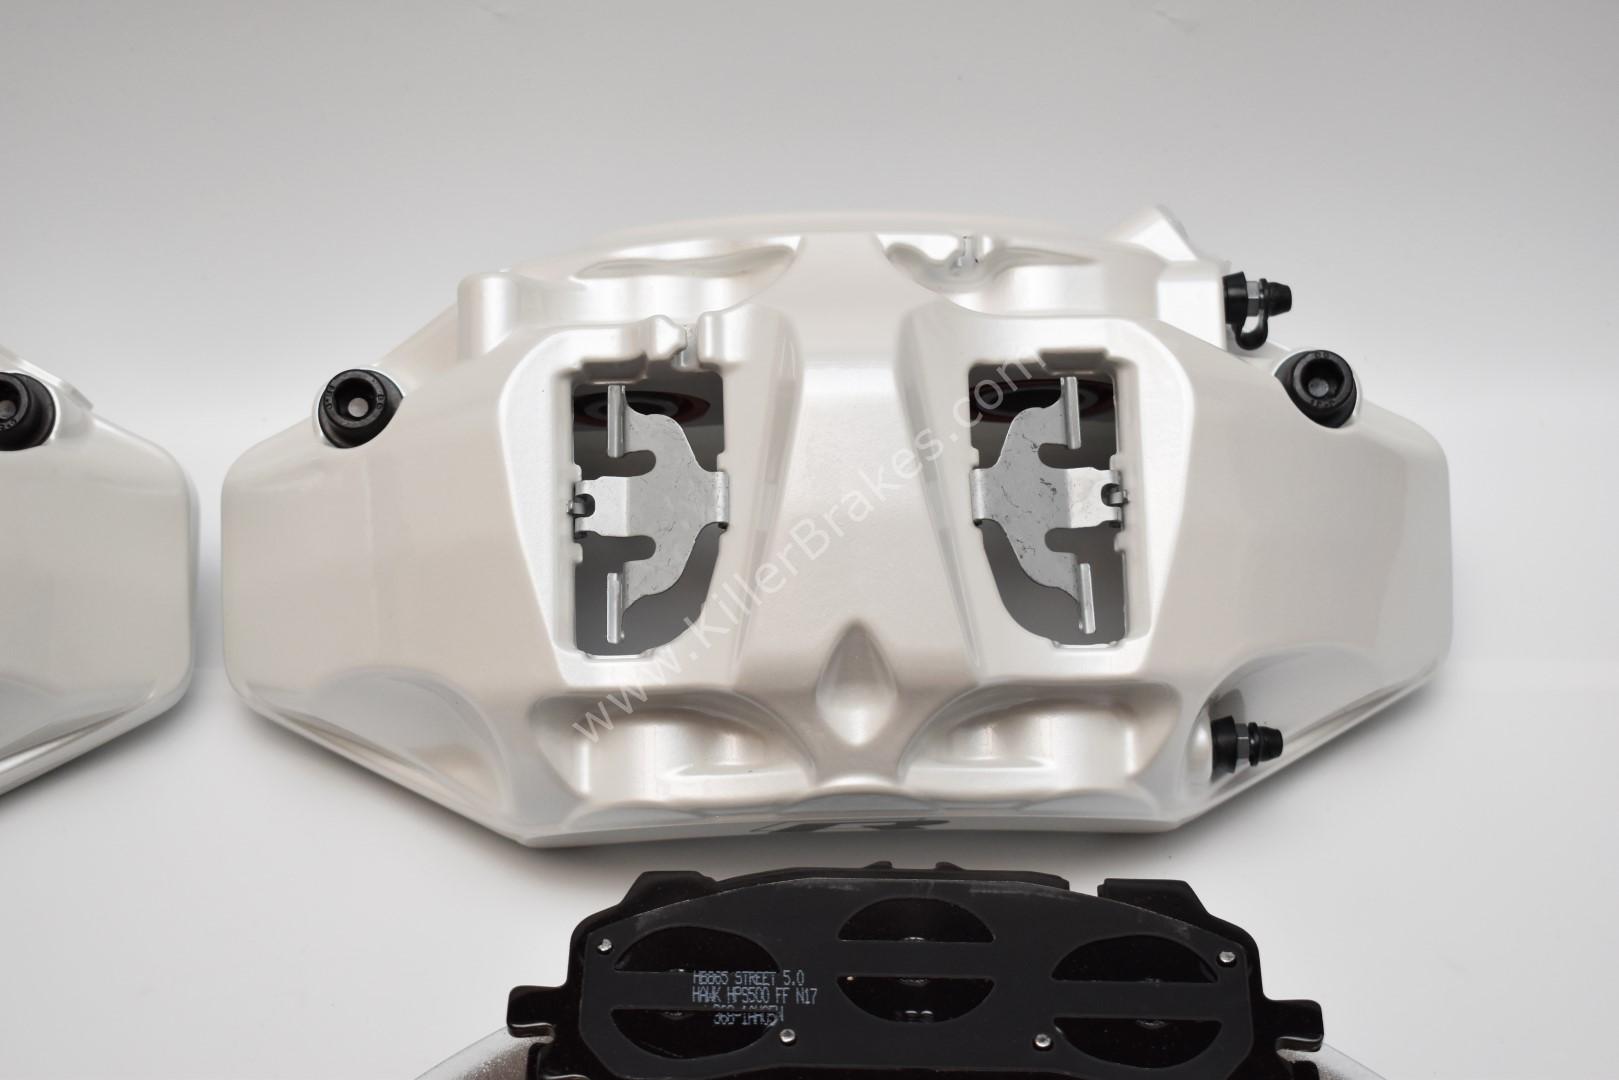 Front Audi Rsq3 F3 Brake Kit Akebono 6pot Oryx White 374x36mm New